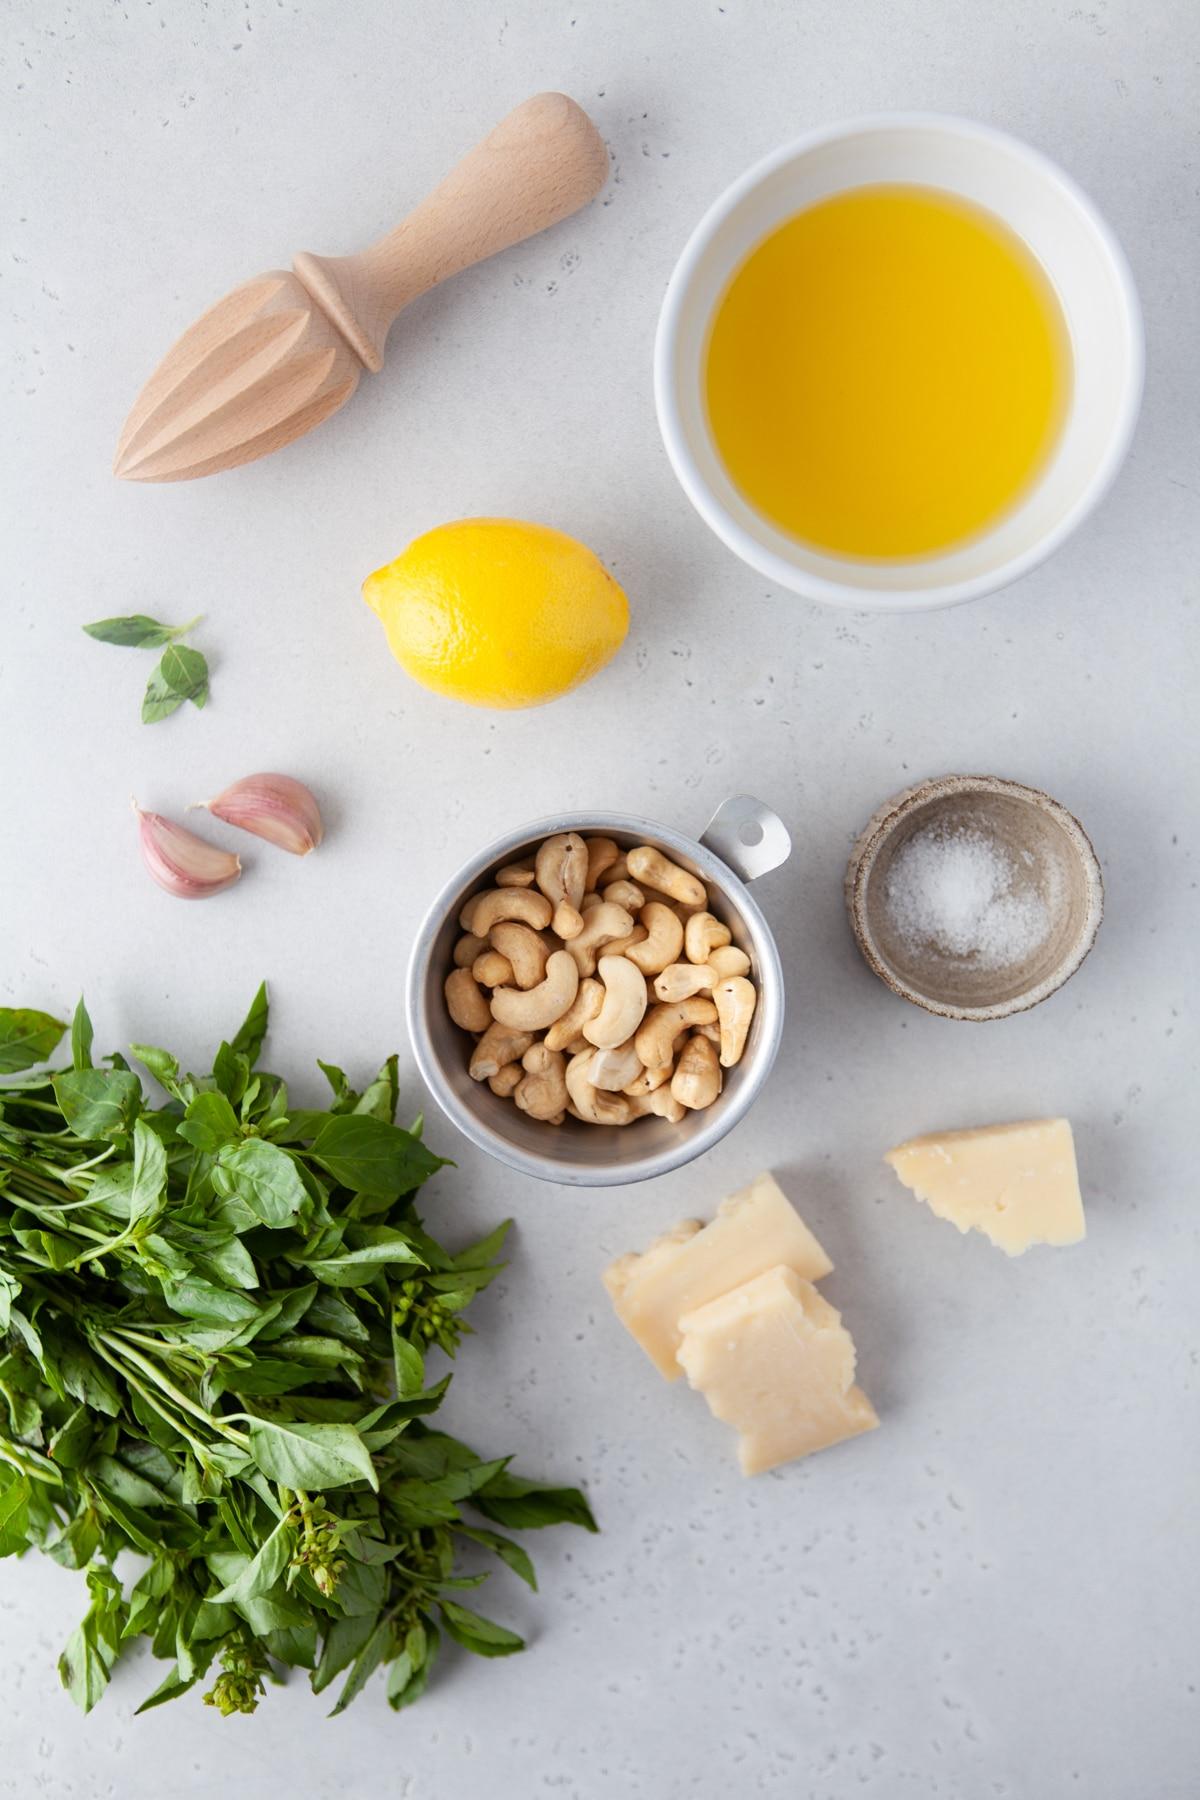 Image of ingredients needed to make cashew pesto sauce.